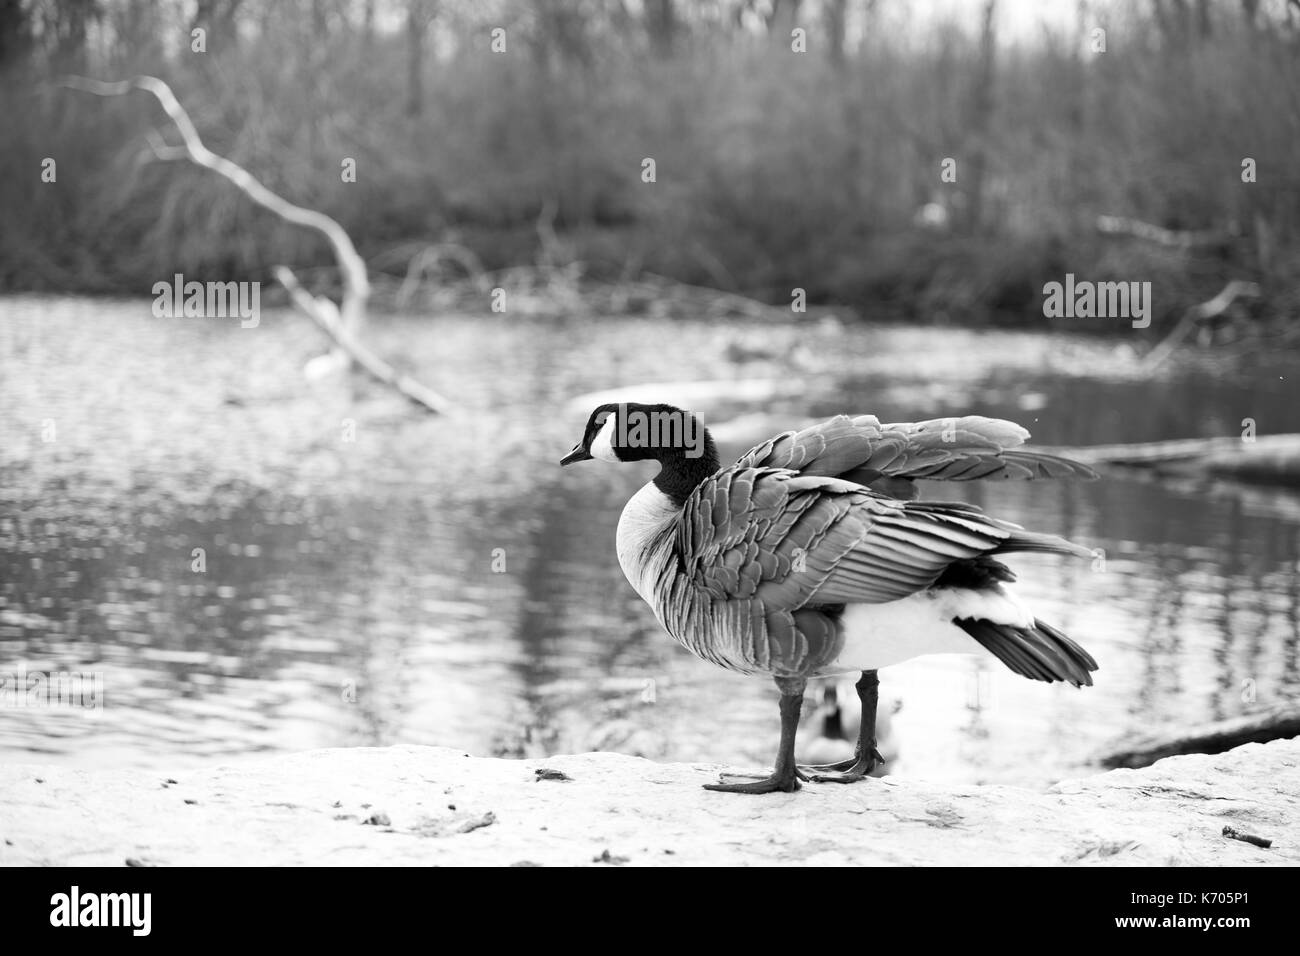 Canada goose north america stock photo 159200441 alamy canada goose north america biocorpaavc Gallery